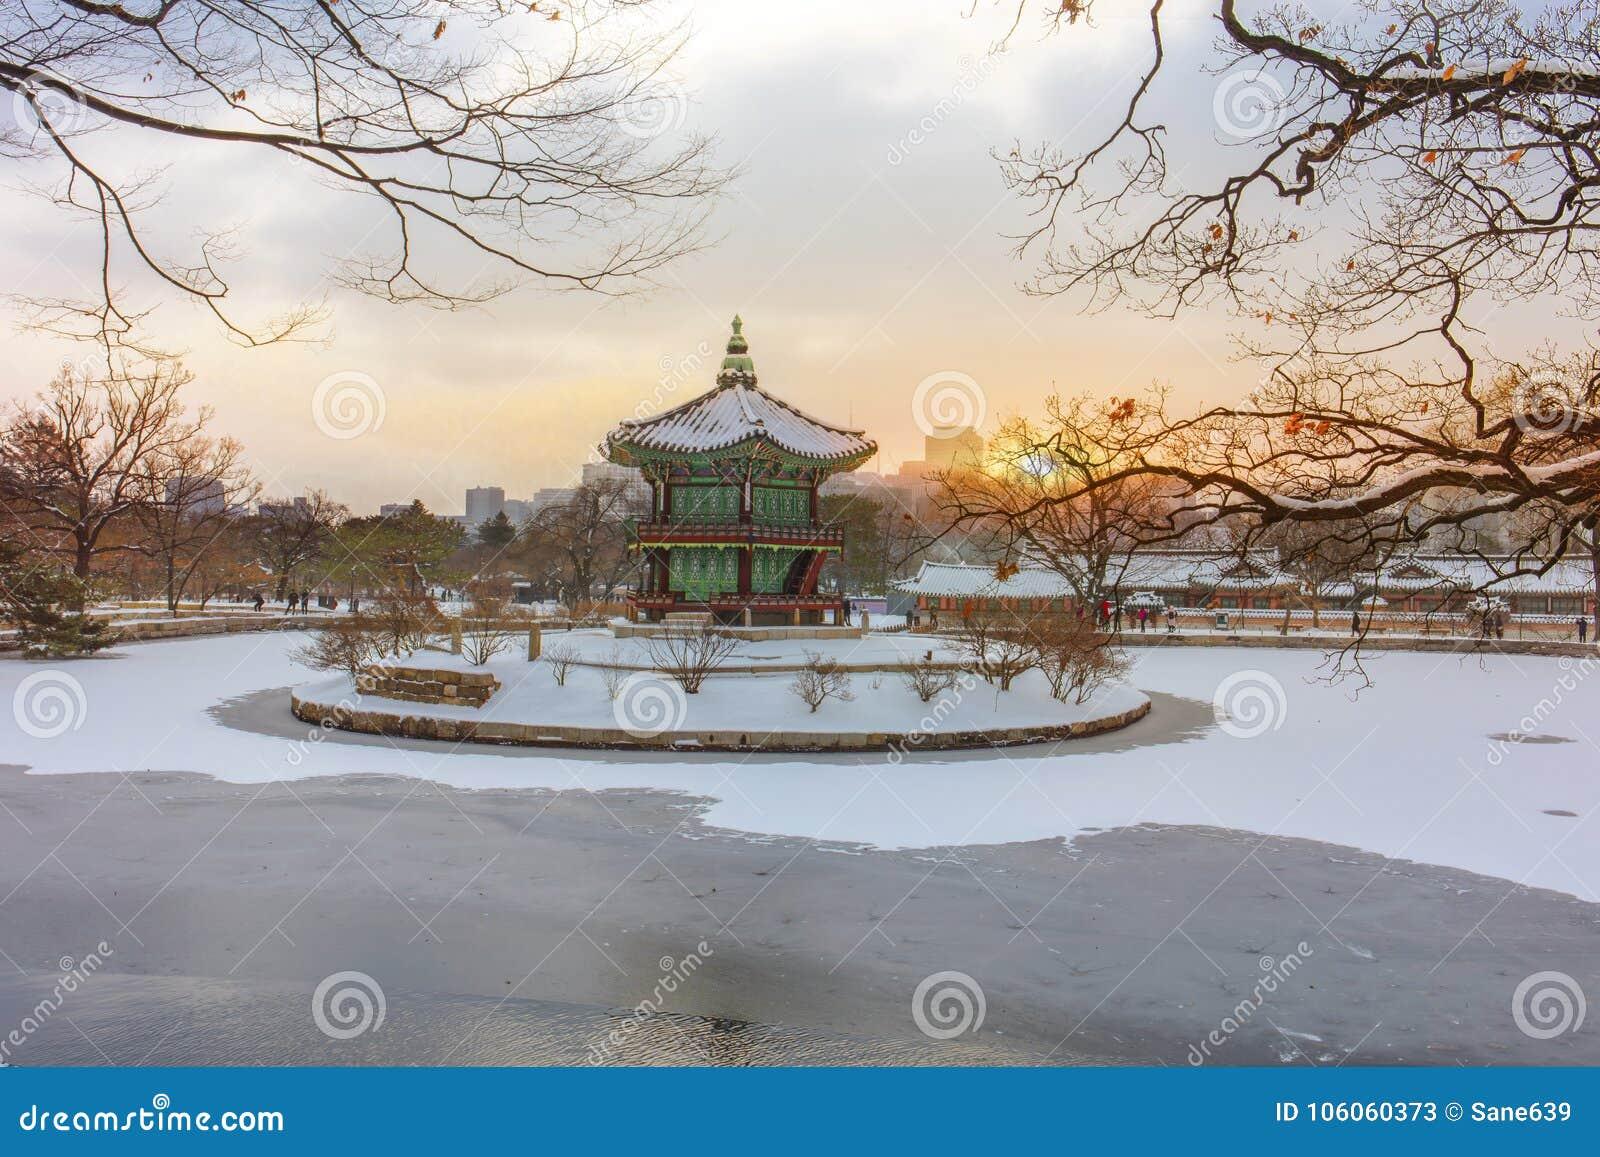 Gyeongbokgung Palace Seoul,South Korea.